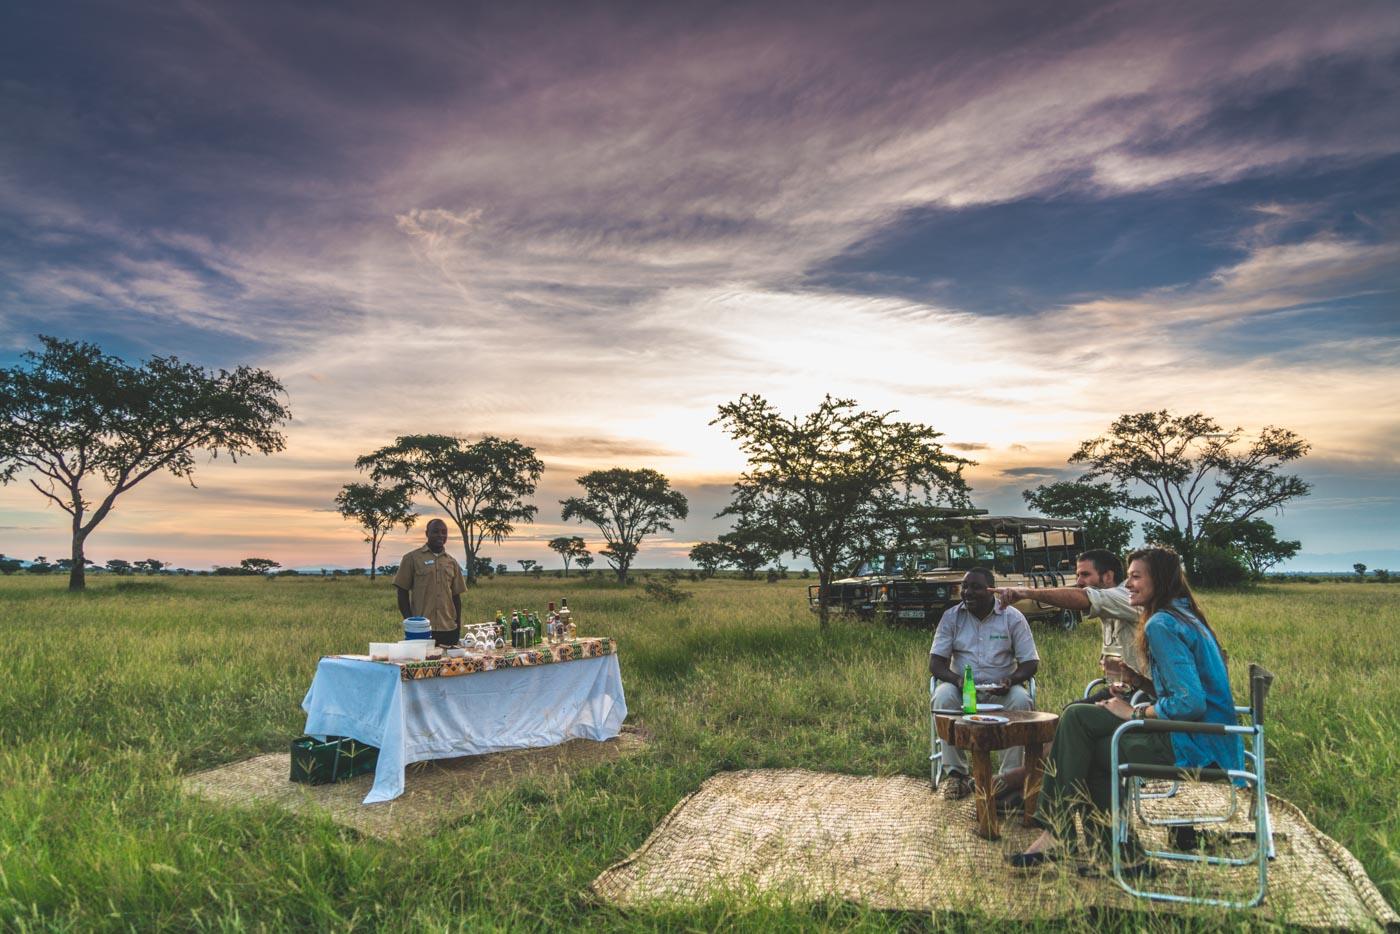 Sundowner on a safari with Ishasha Wilderness Camp in Queen Elizabeth National Park